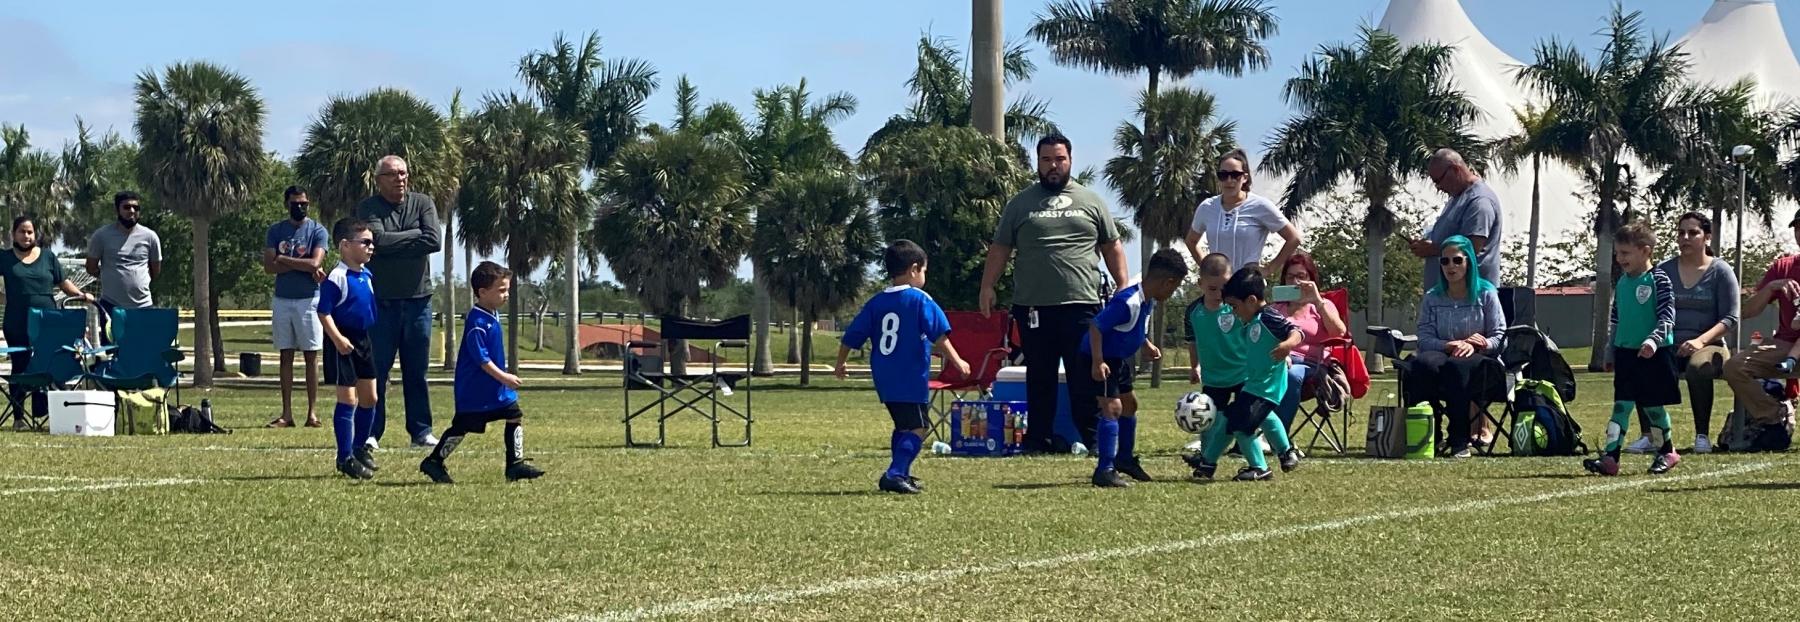 2021 Outdoor Soccer